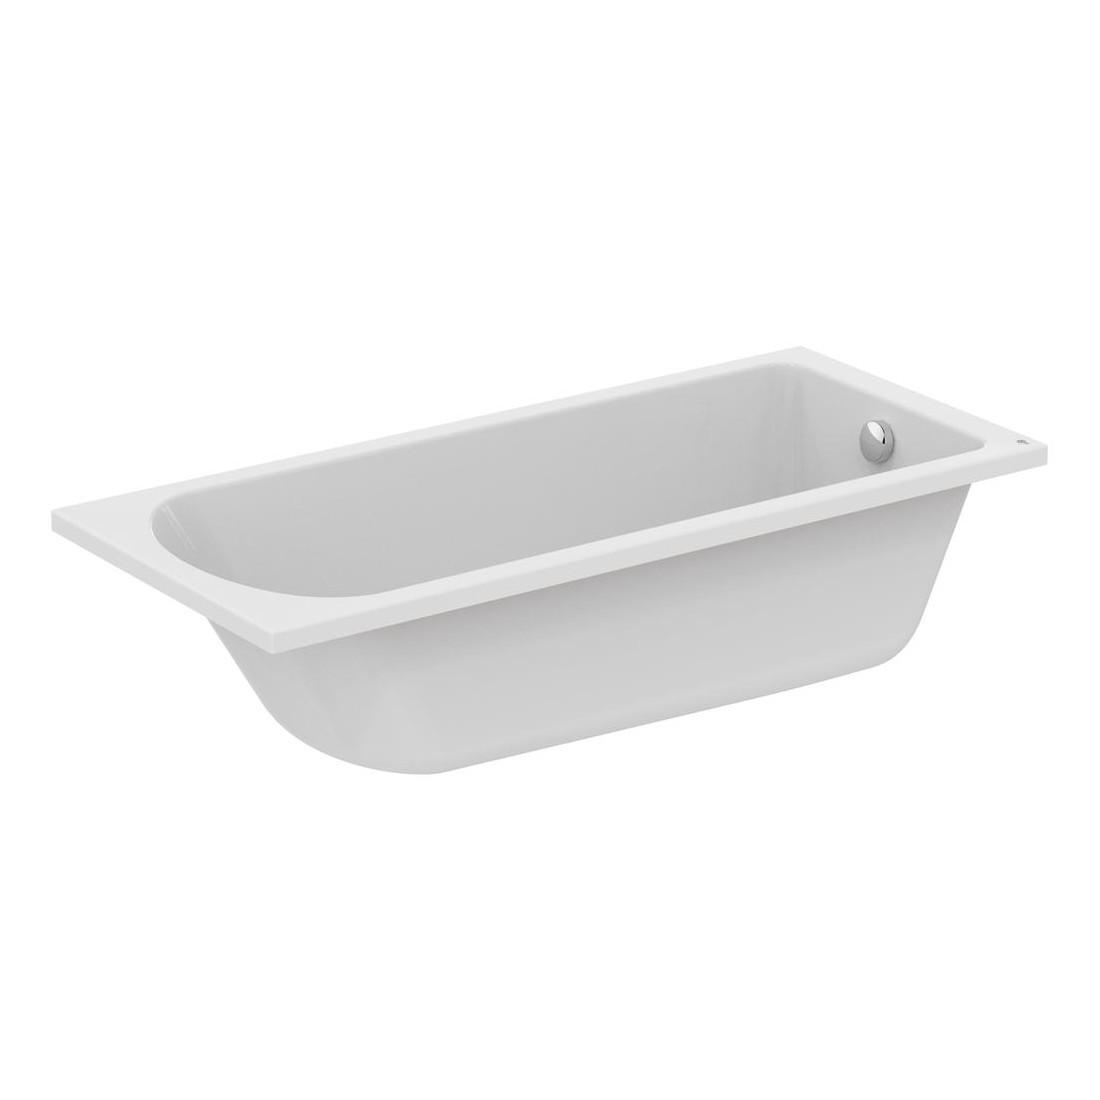 Akrilo vonia Ideal Standard, Hotline, 170x75, įmontuojama